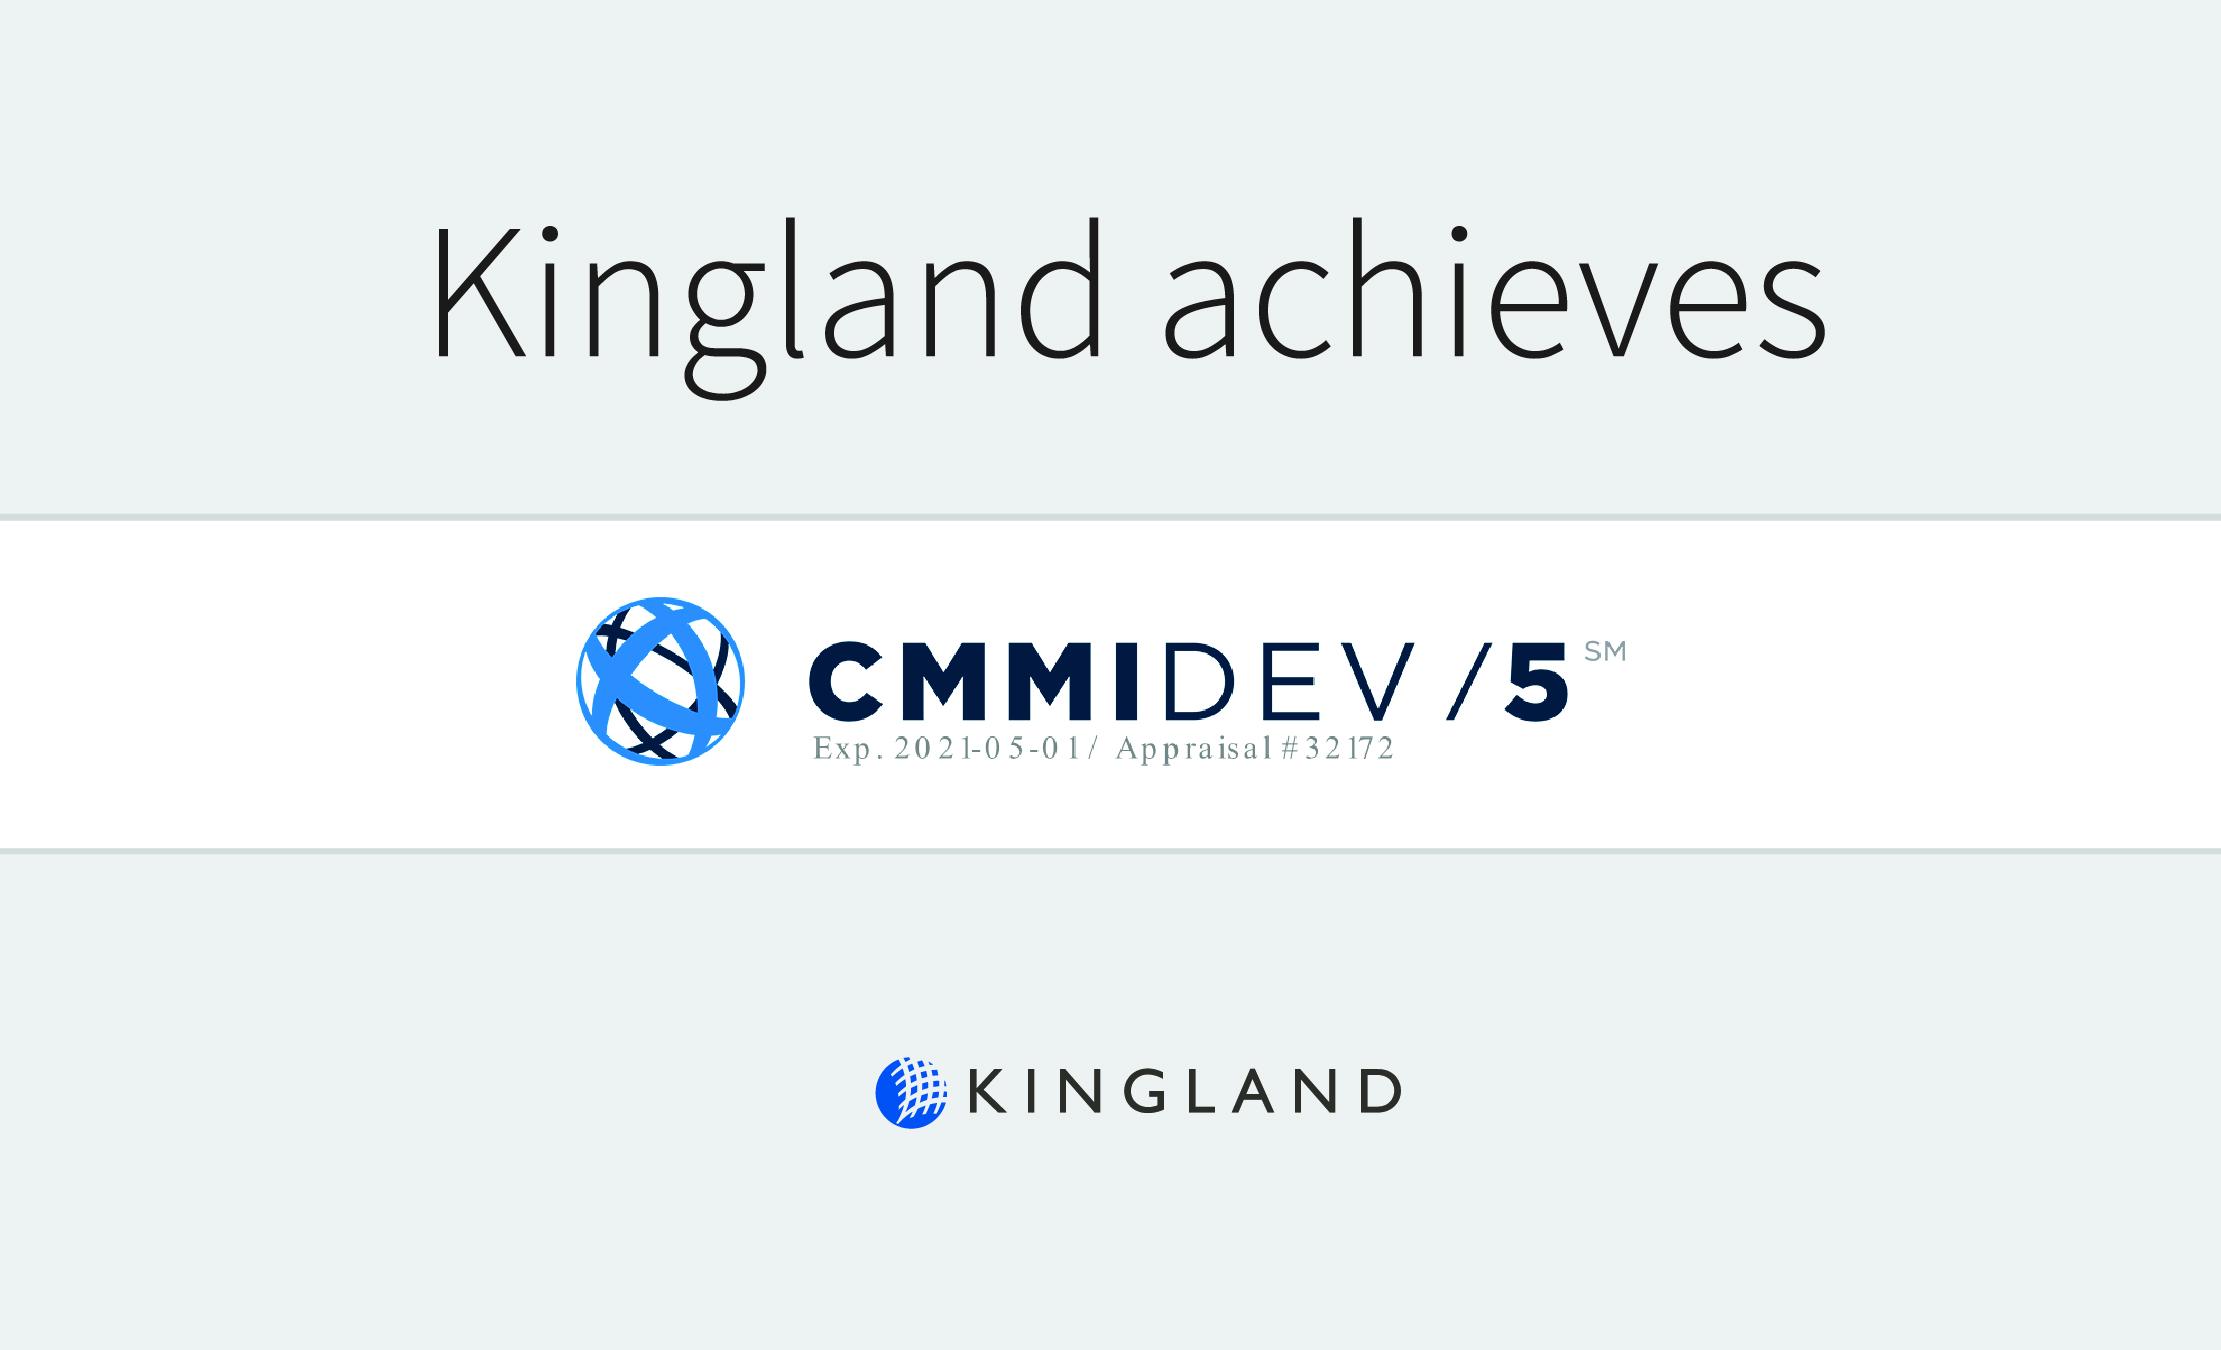 Kingland achieves CMMI Level 5 Maturity